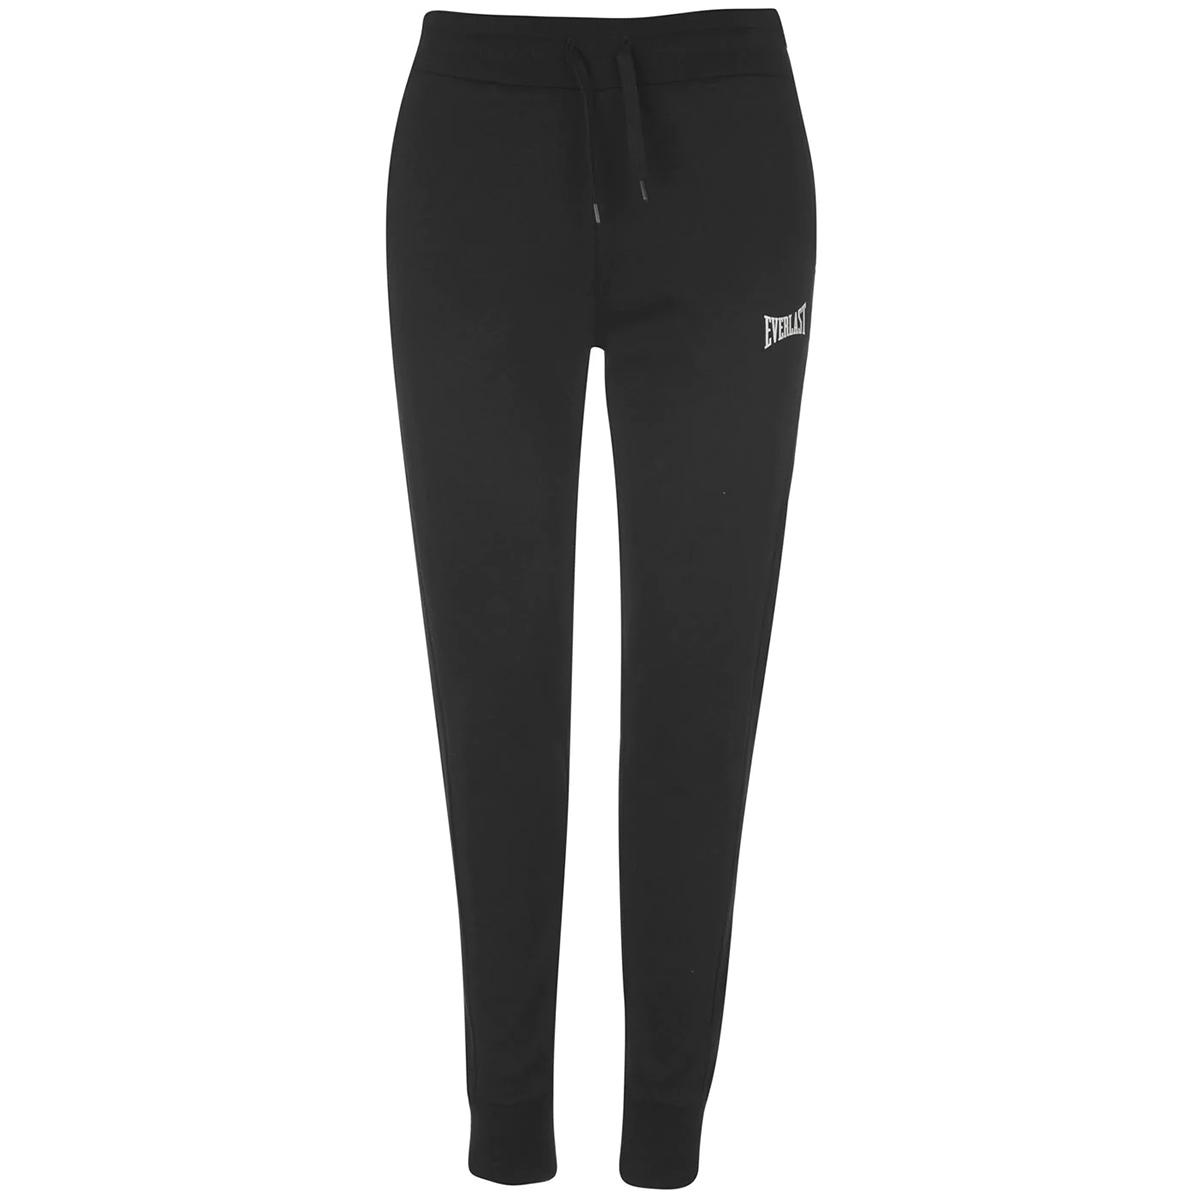 Everlast Women's Jogging Pants - Black, 4